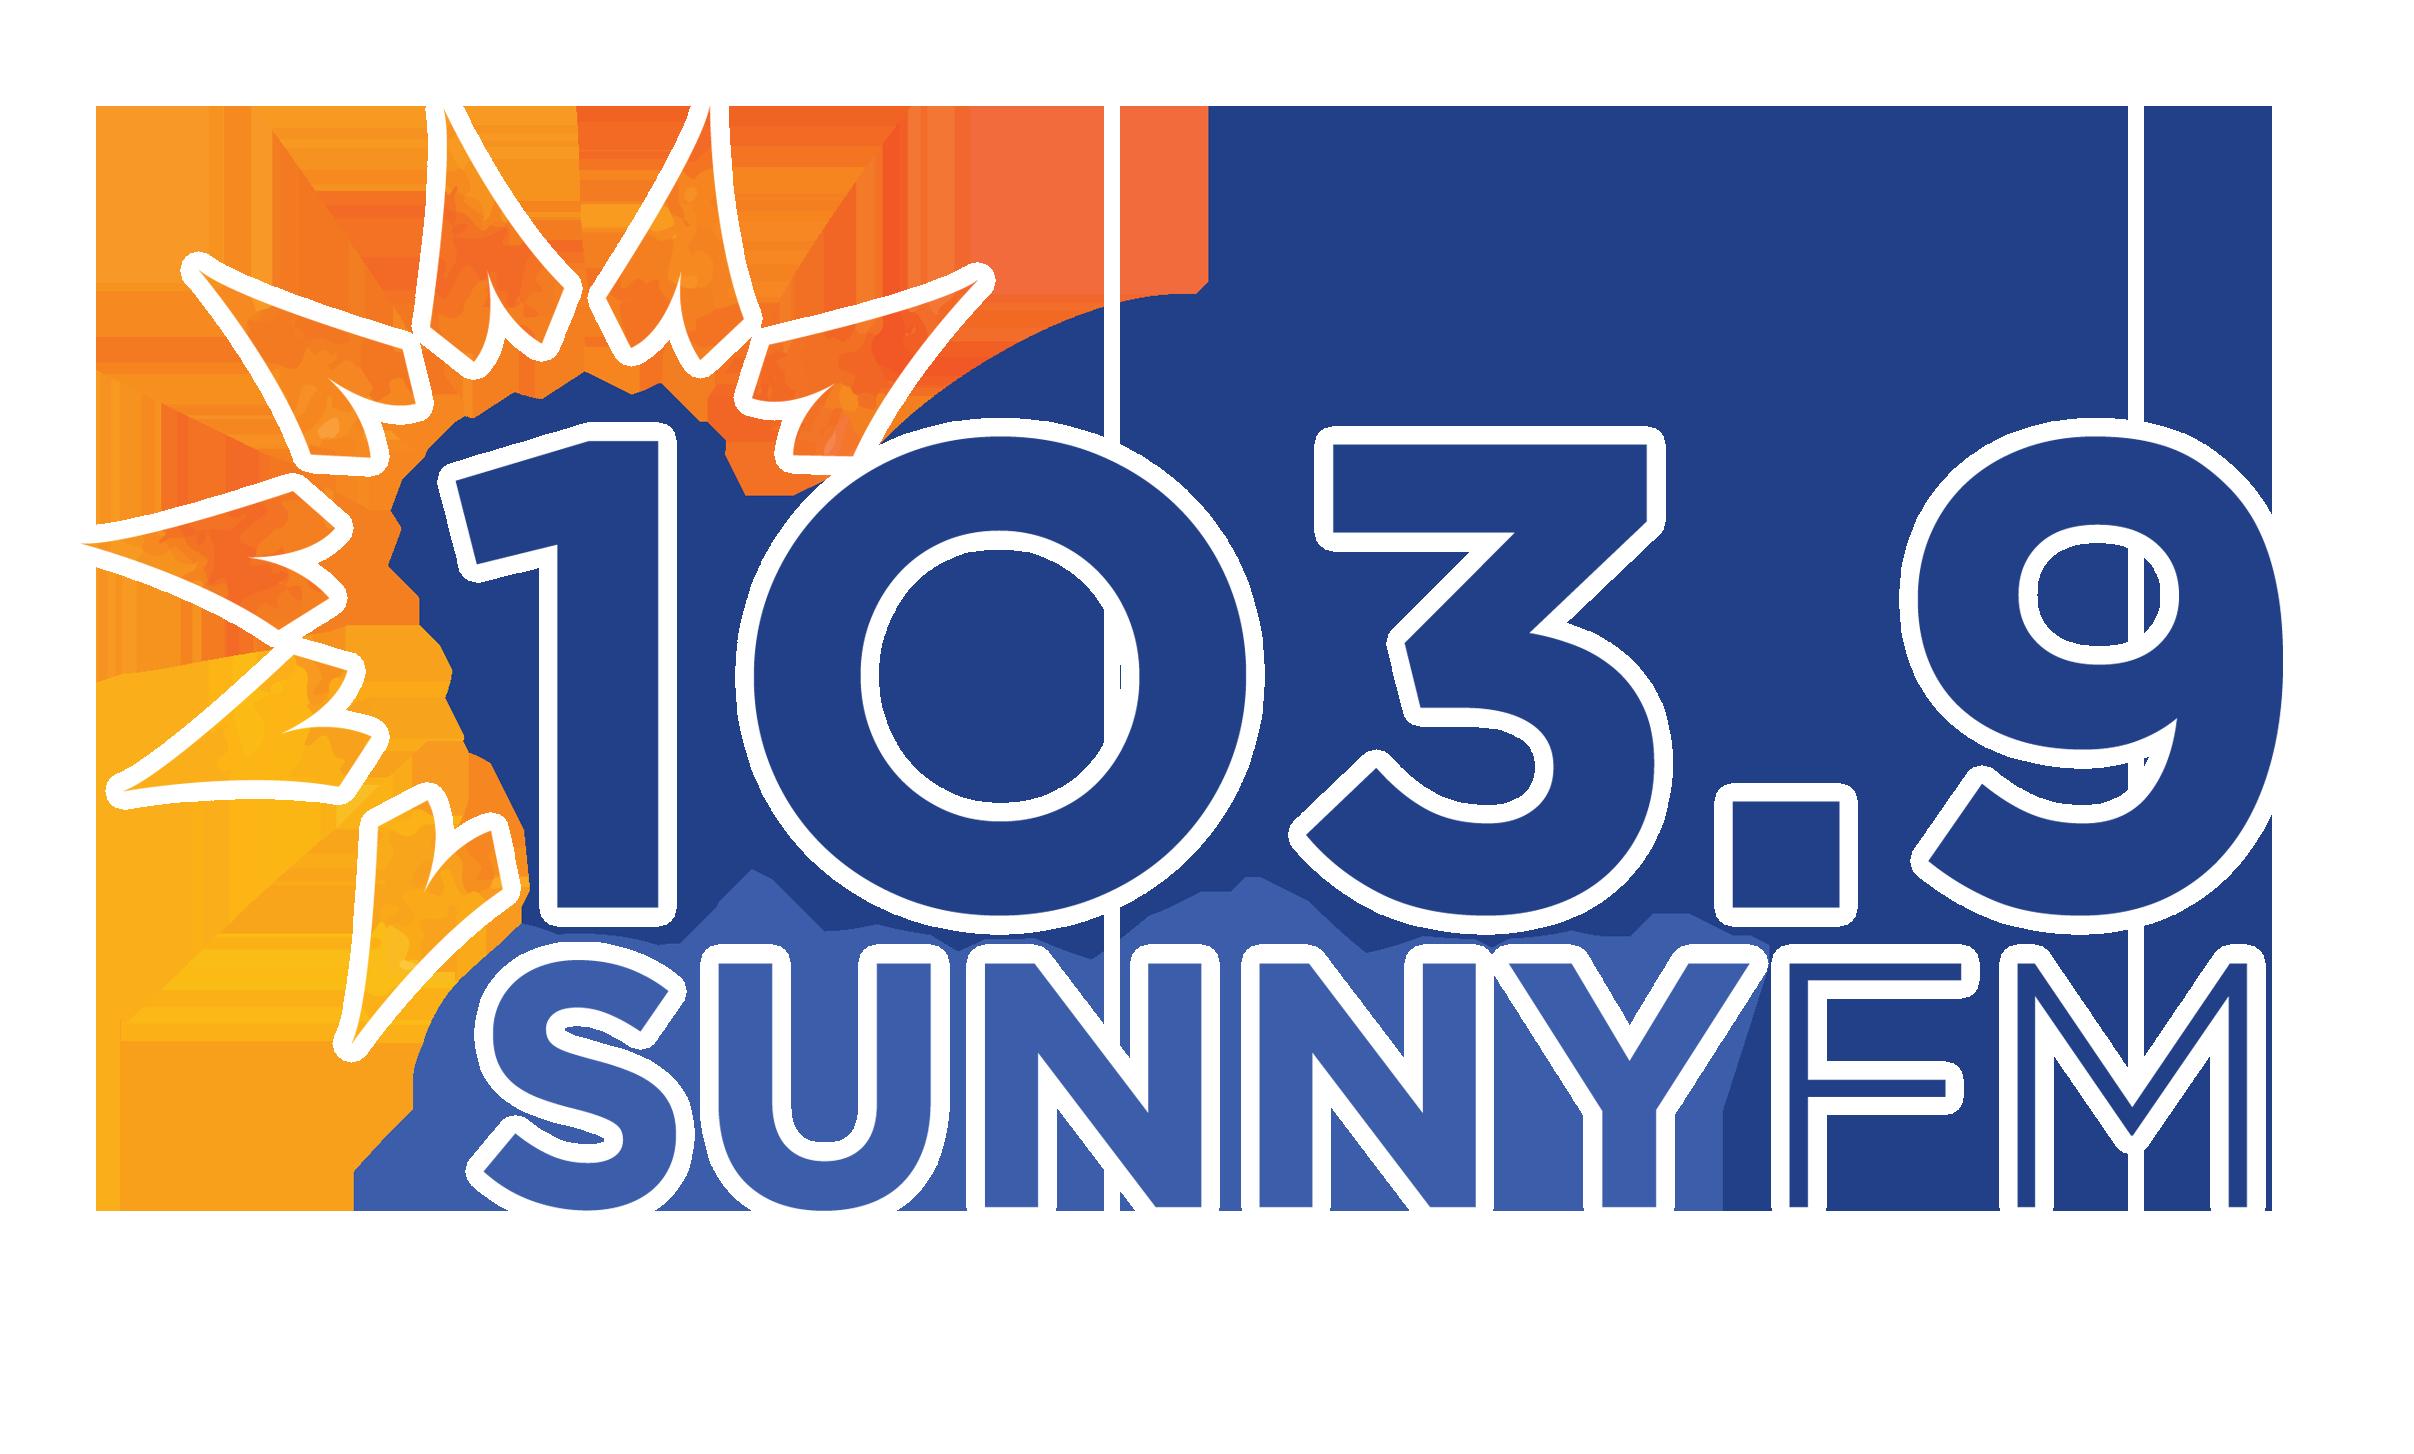 103.9 SunnyFM.png